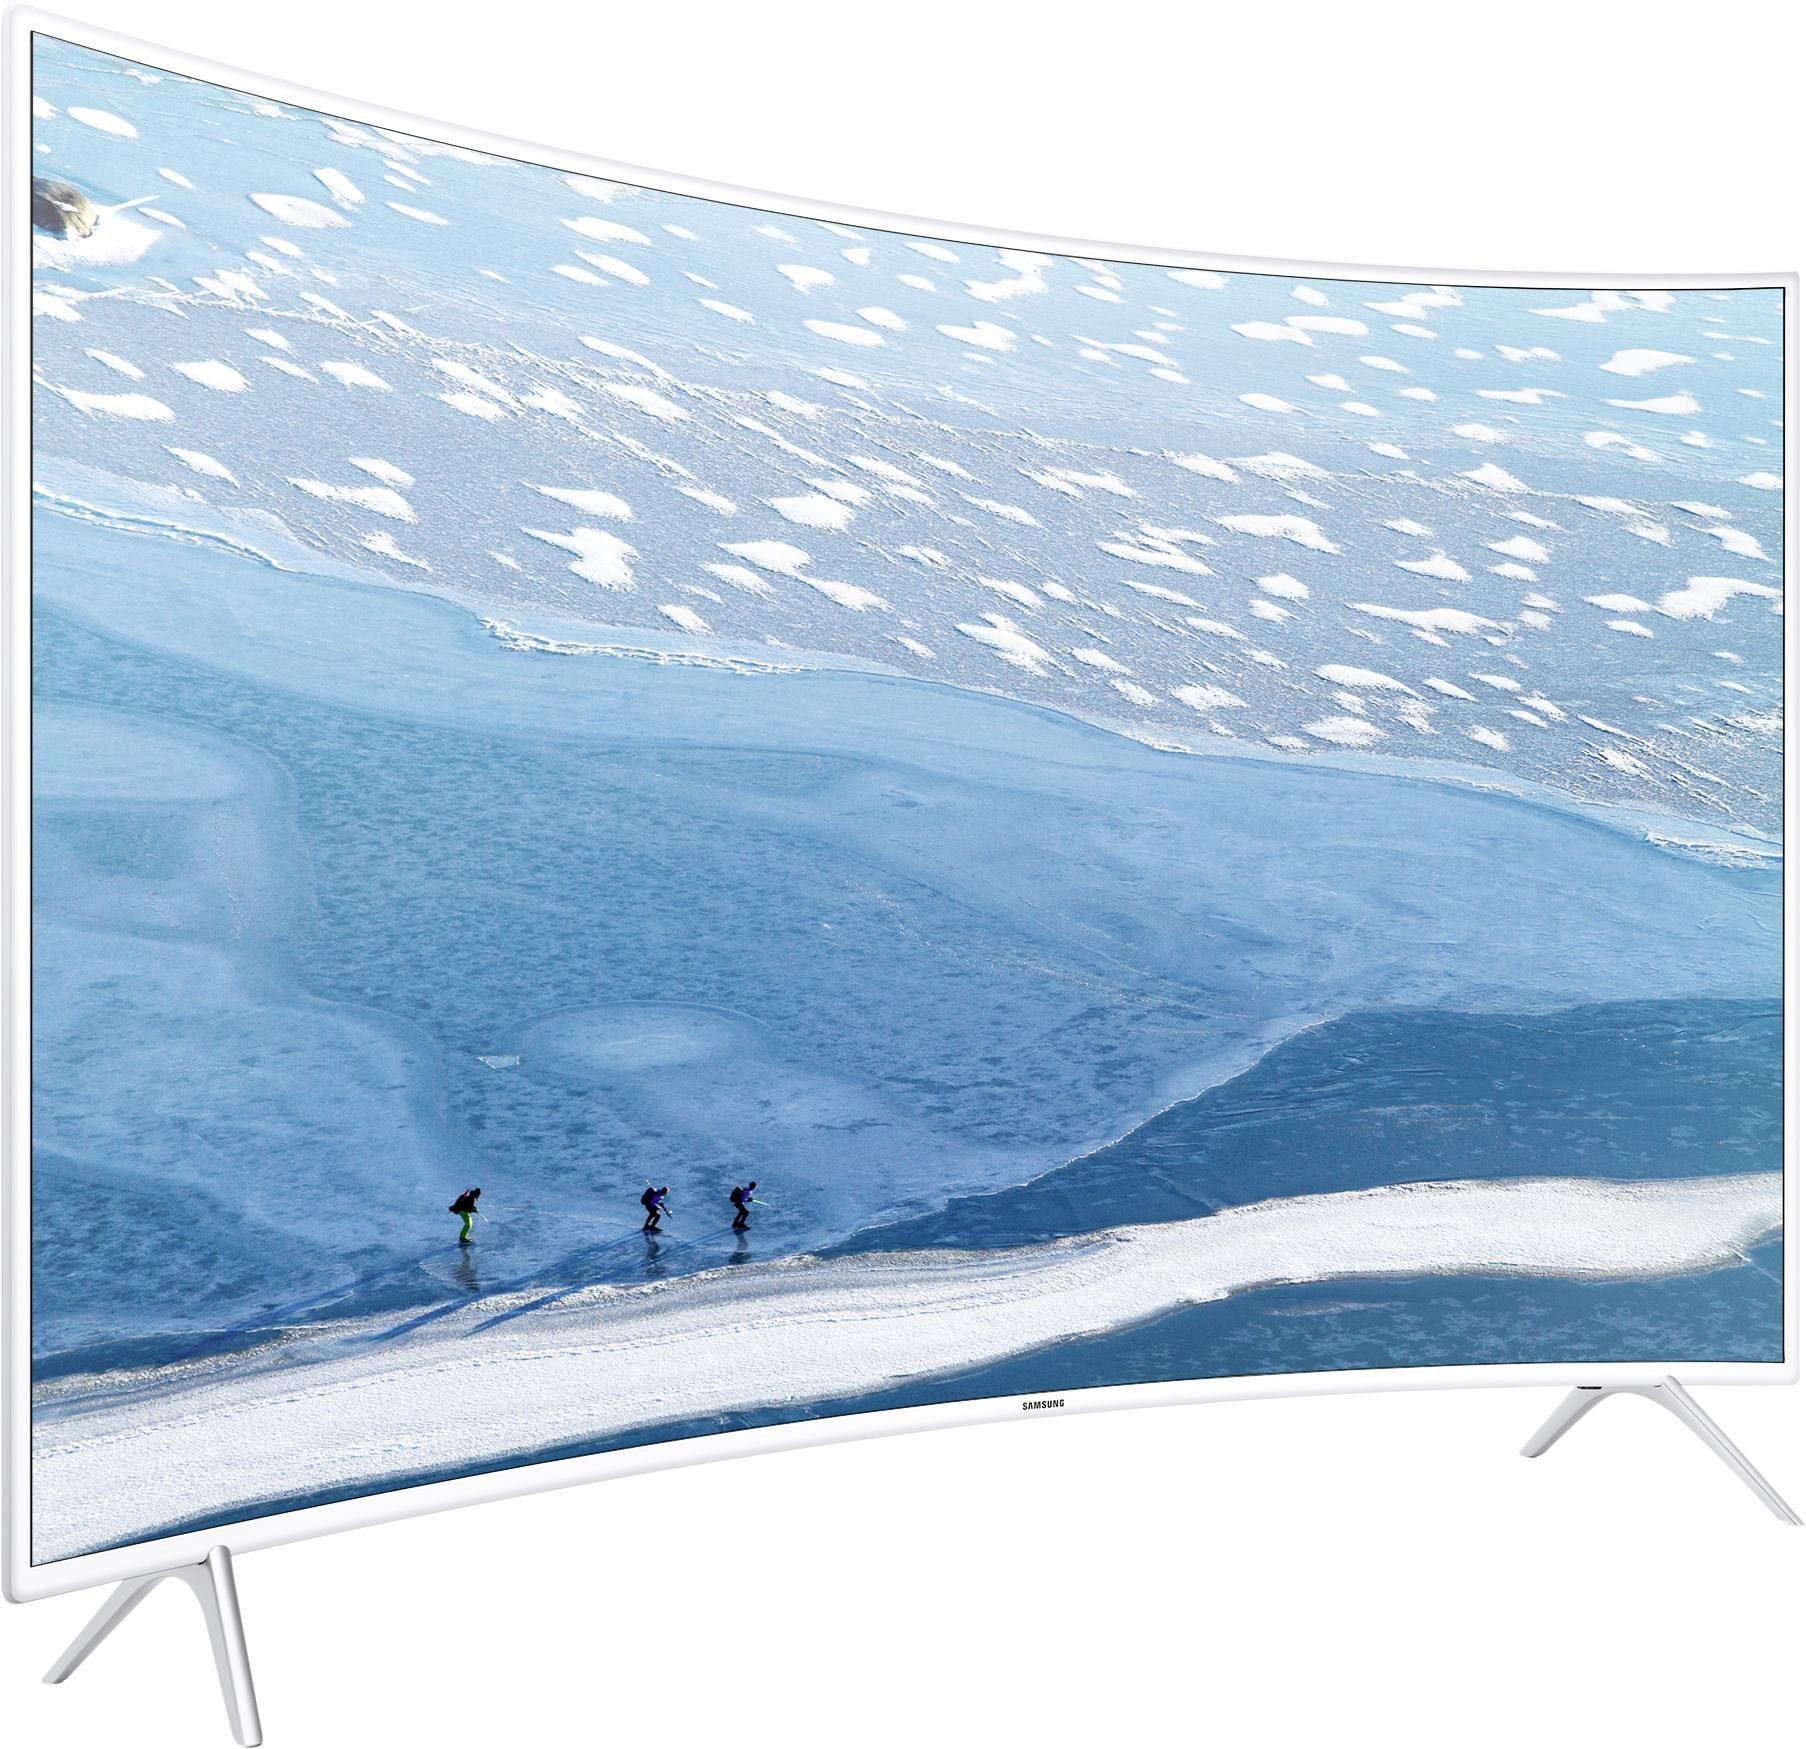 Samsung UE49KU6519UXZG, Curved-LED-Fernseher, 123 cm (49 Zoll), 2160p (4K Ultra HD), Smart-TV